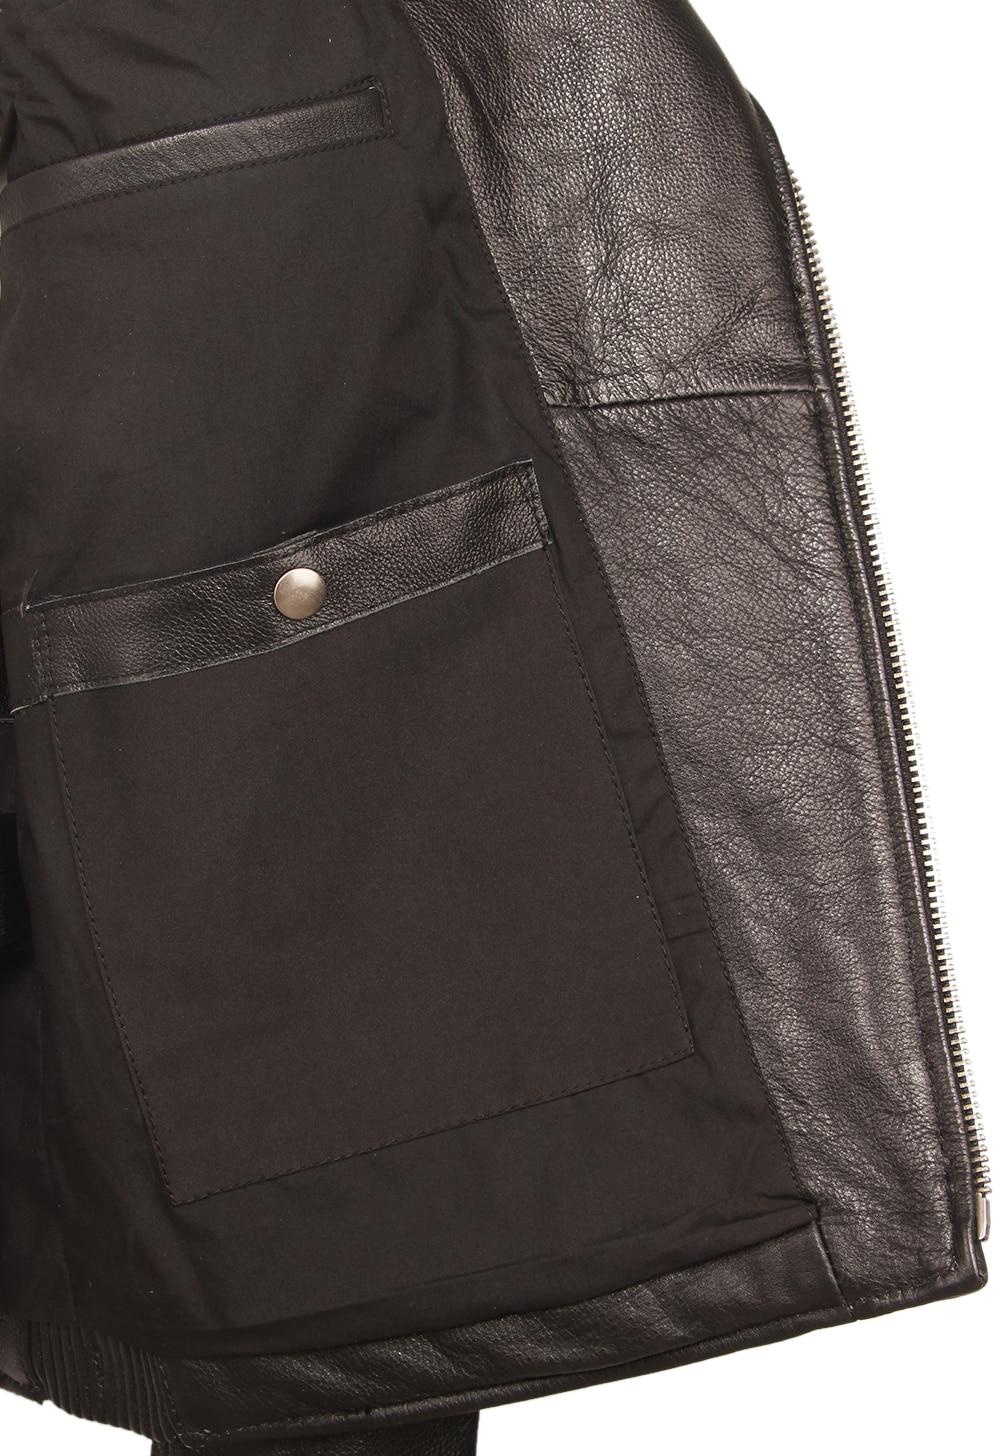 H235df92db1ed4c8ba12606adb61e7b9cl Vintage Motorcycle Jacket Slim Fit Thick Men Leather Jacket 100% Cowhide Moto Biker Jacket Man Leather Coat Winter Warm M455